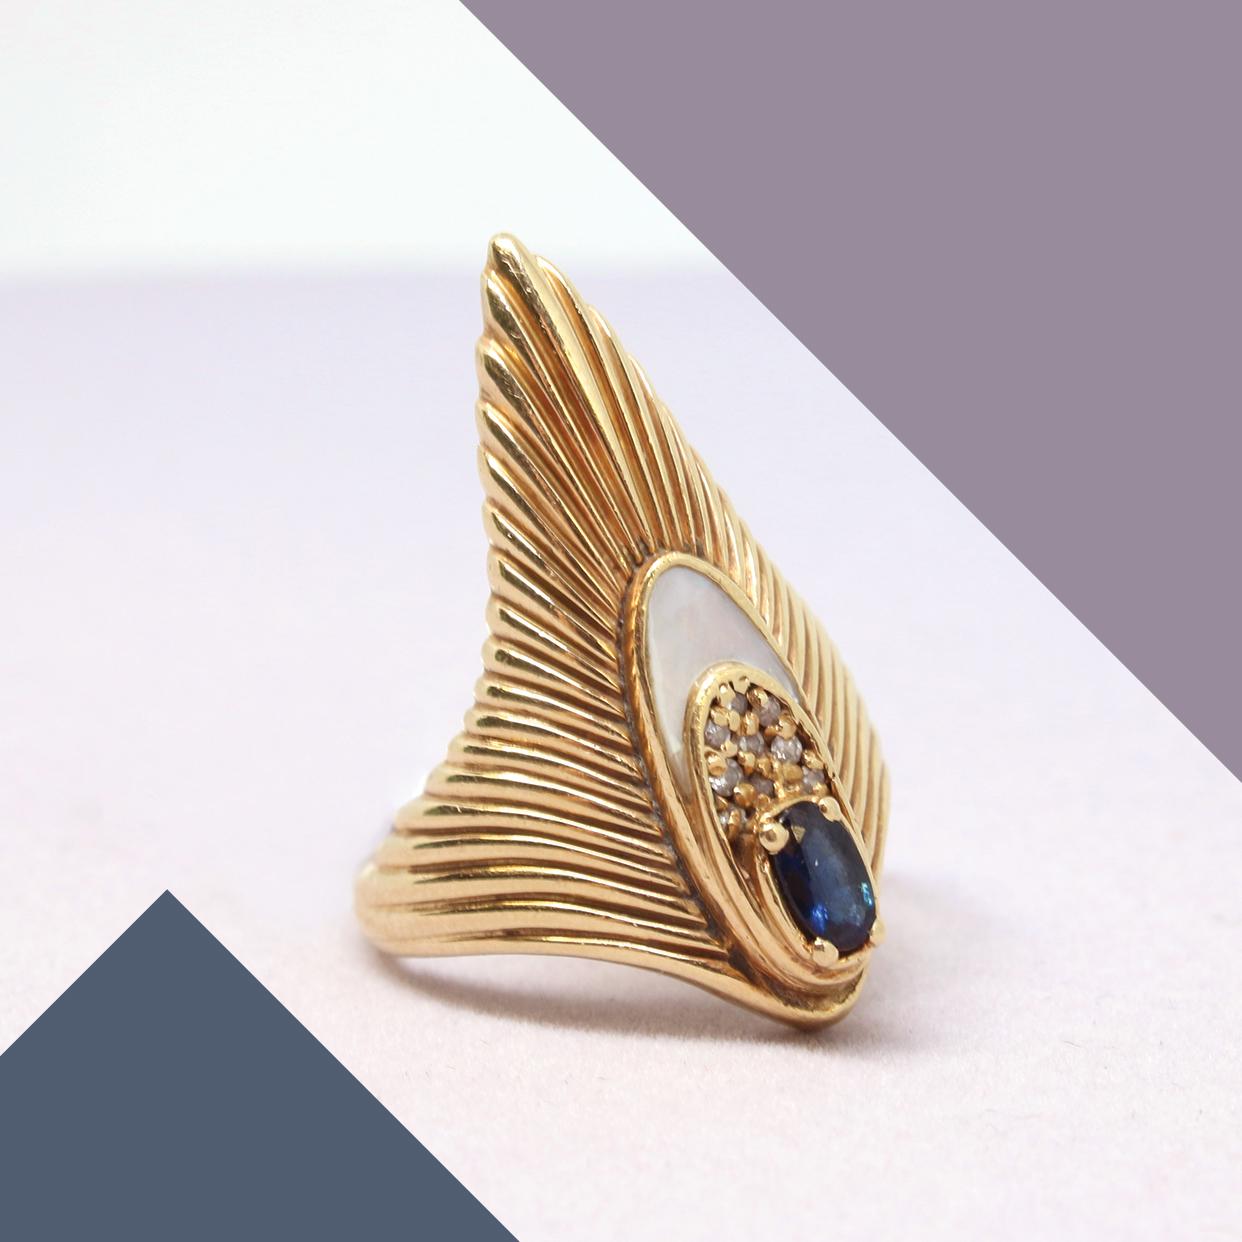 Art Deco Erte Ring - 14 Karat Yellow & Sapphire